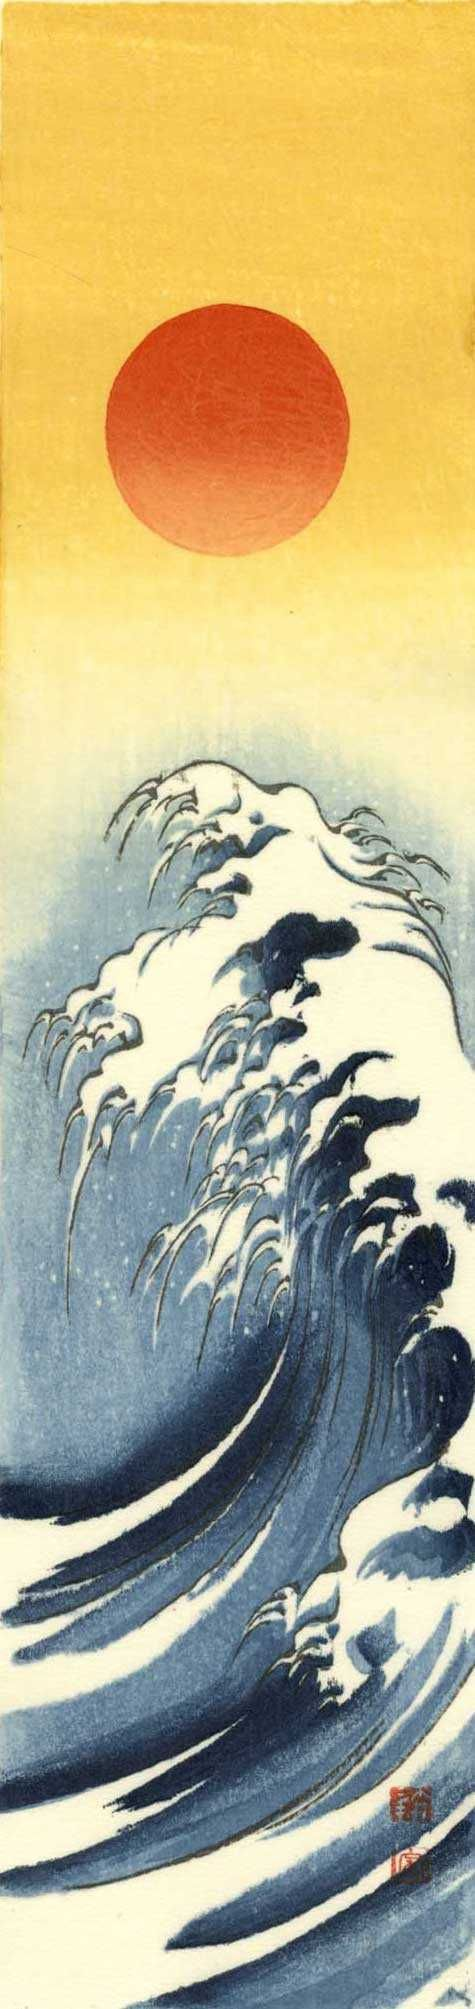 """Sun and Wave"" by SHODA, Koho (1870-1946), ca 1920-30"